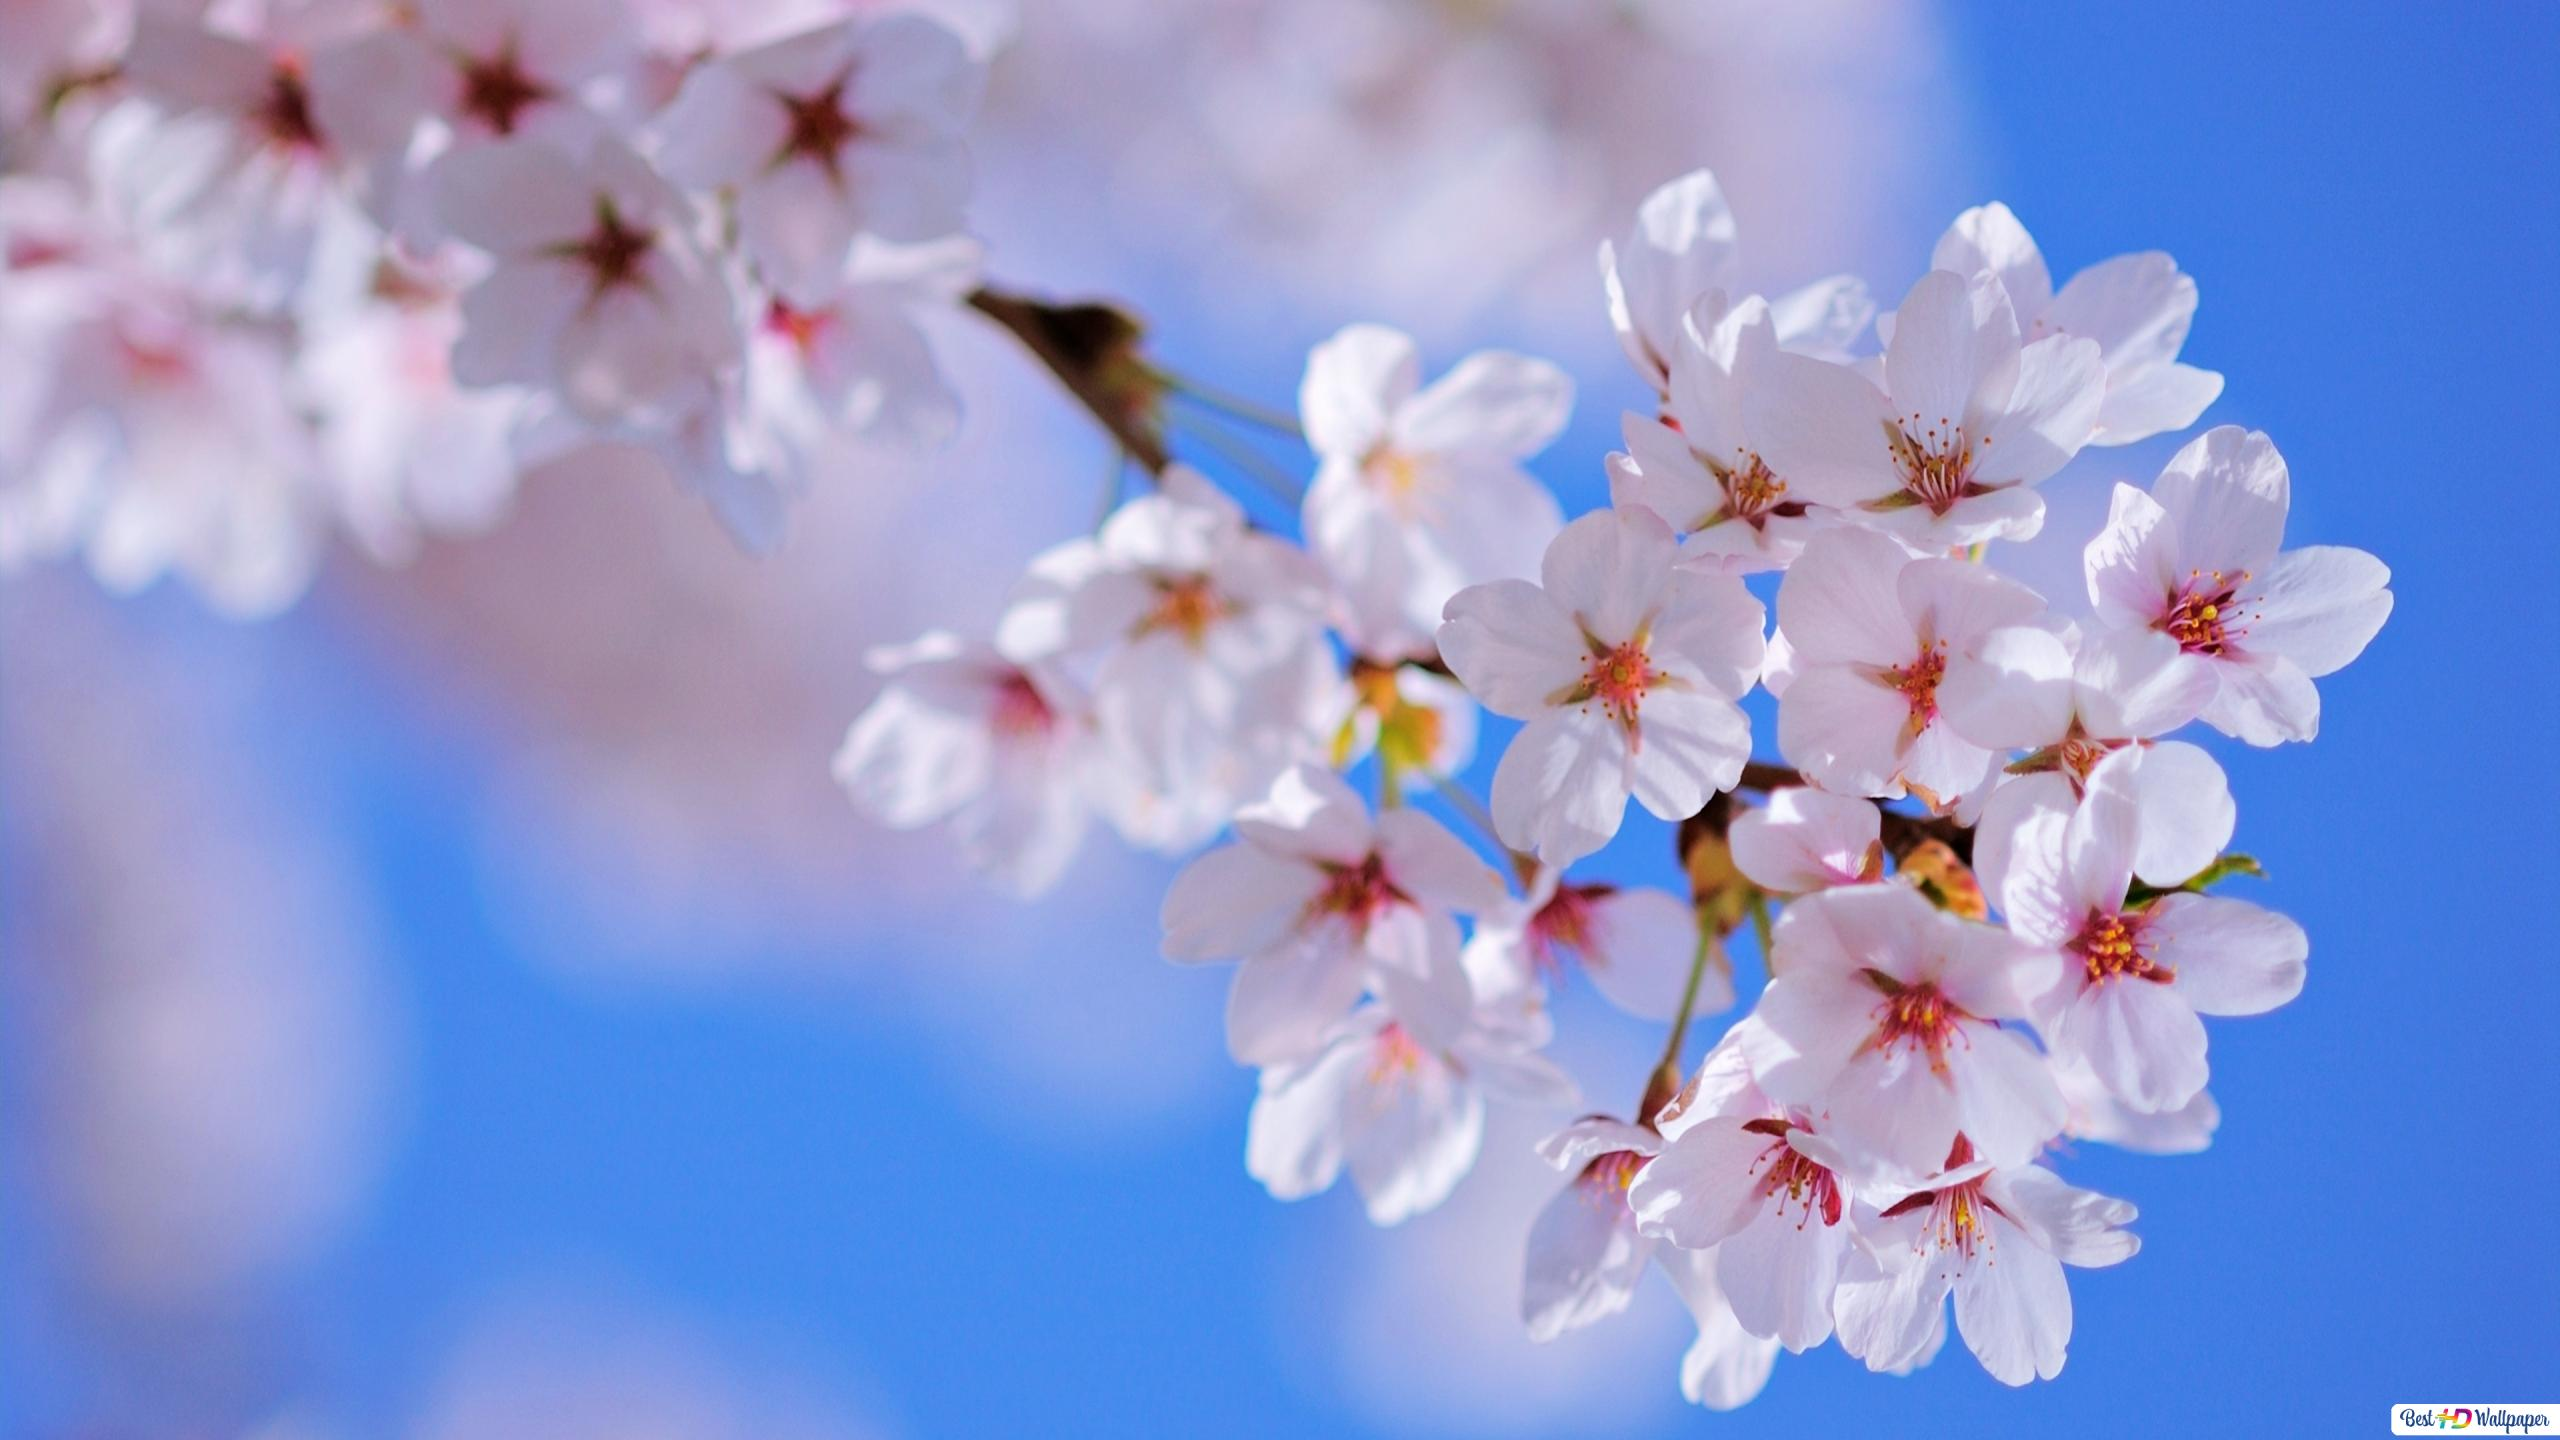 Nature Fleur Blanche Hd Fond D Ecran Telecharger